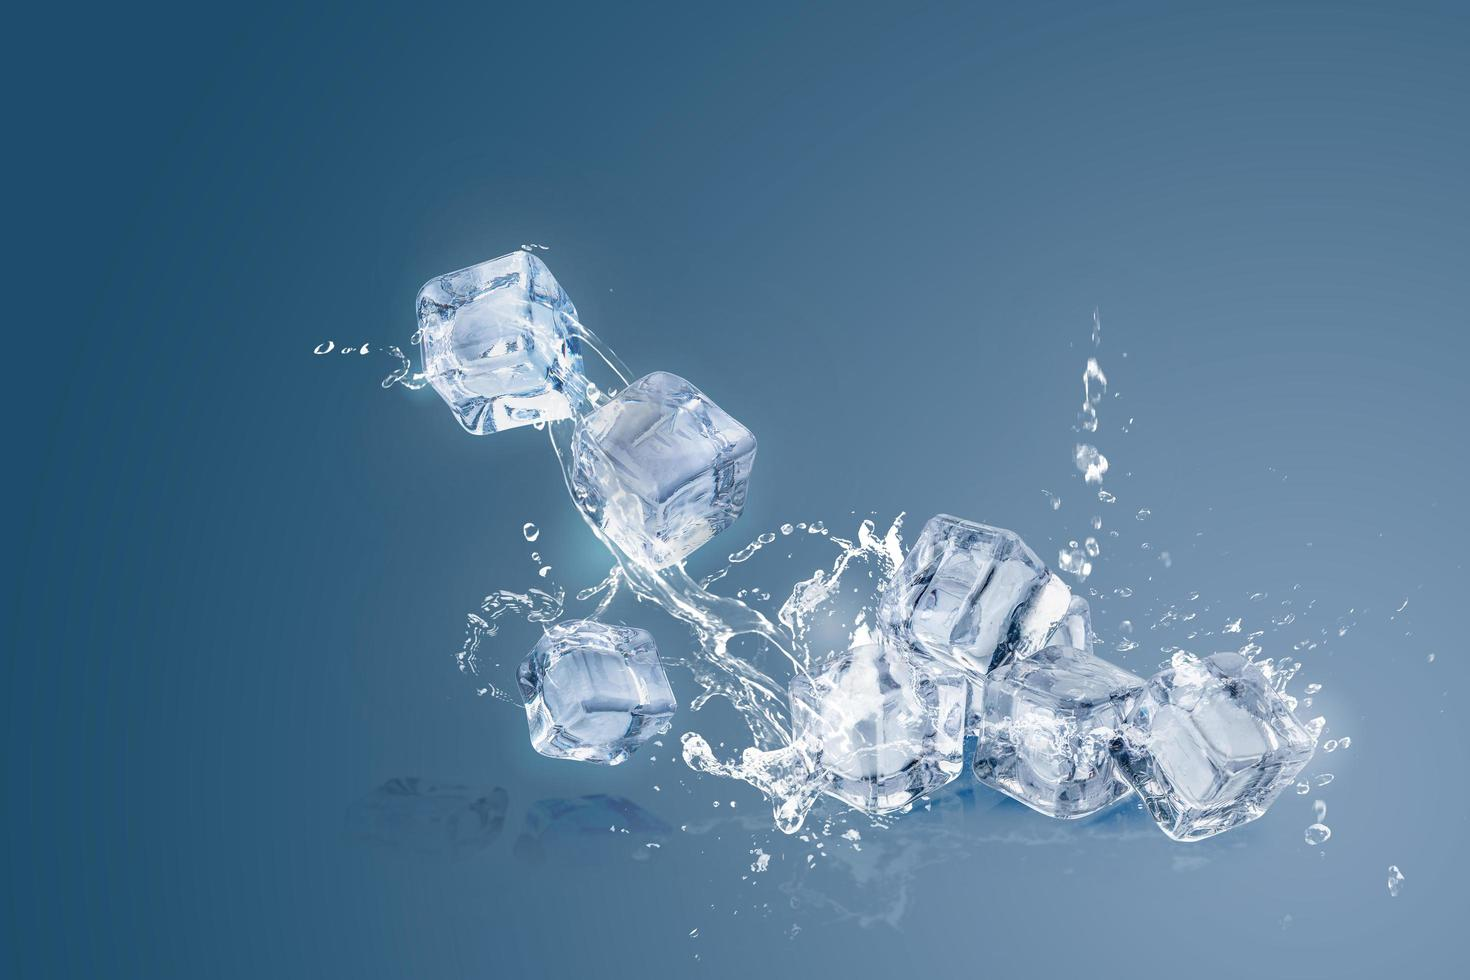 cubitos de hielo aislados sobre un fondo azul foto